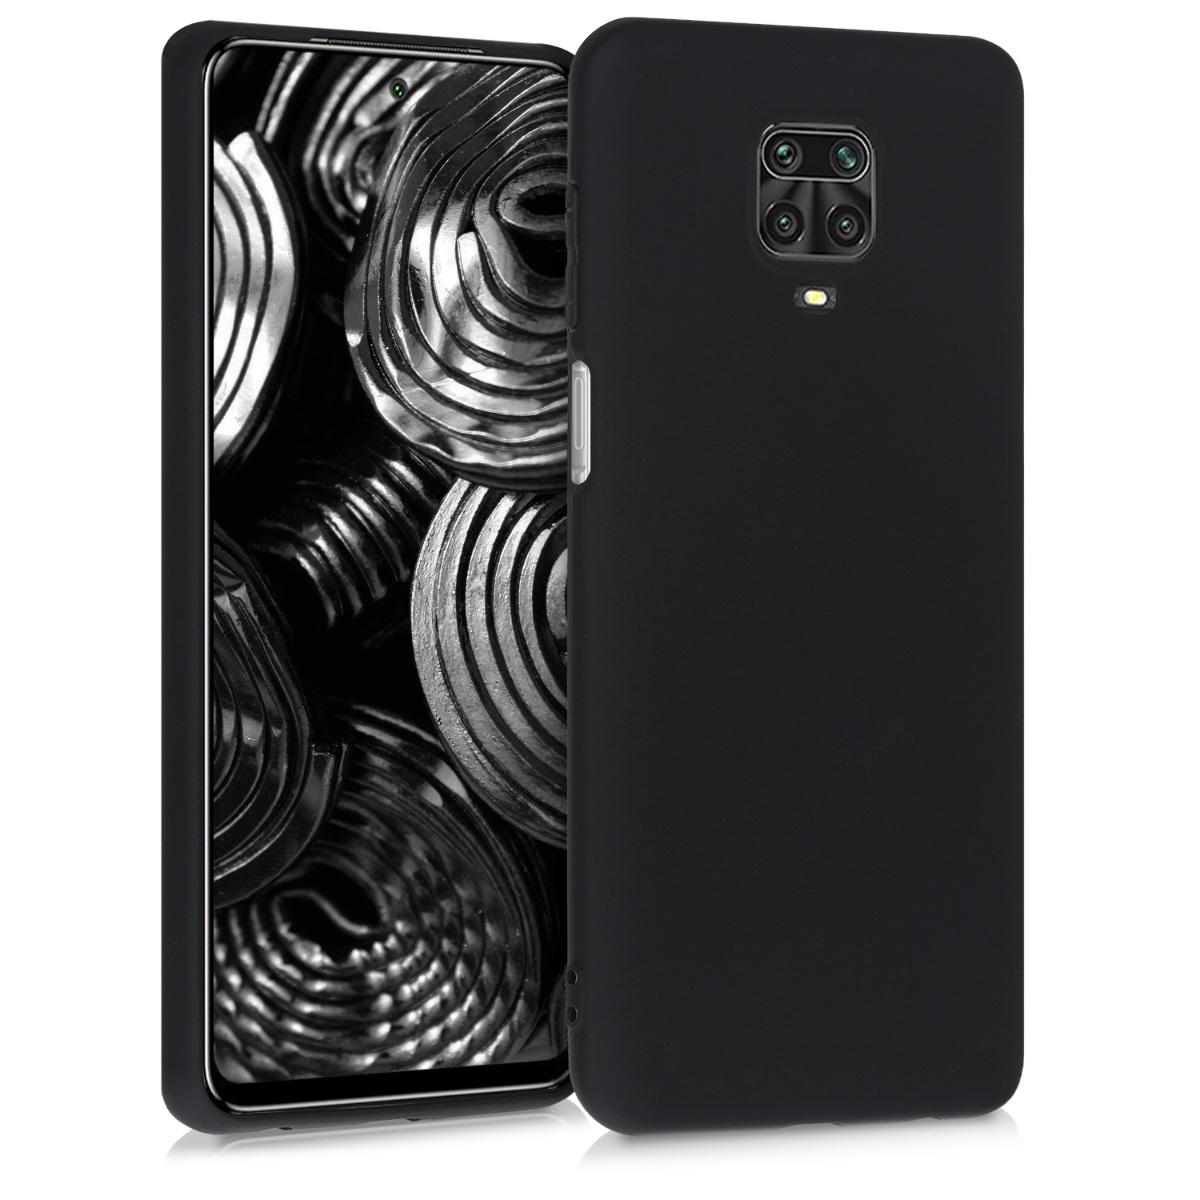 KW Θήκη Σιλικόνης Xiaomi Redmi Note 9S / 9 Pro / 9 Pro Max - Black Matte (52140.47)